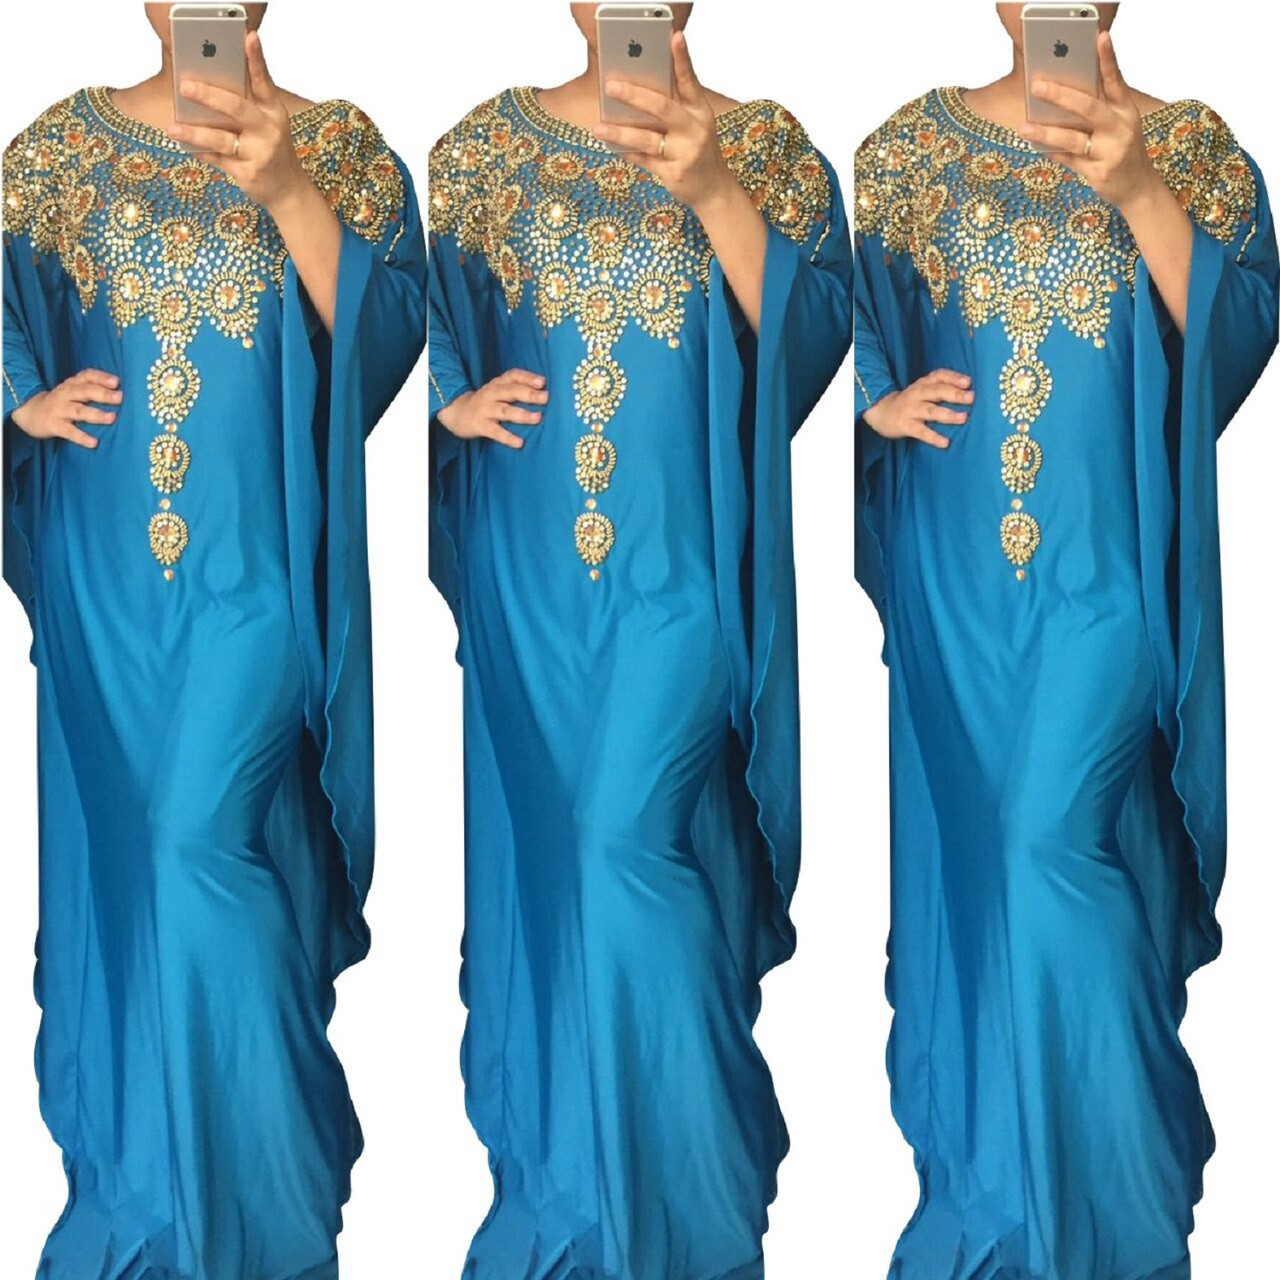 Kaftan Maxi Dress Evening Gowns Evening Dresses Wedding Dress Cocktail Plus Size 5507